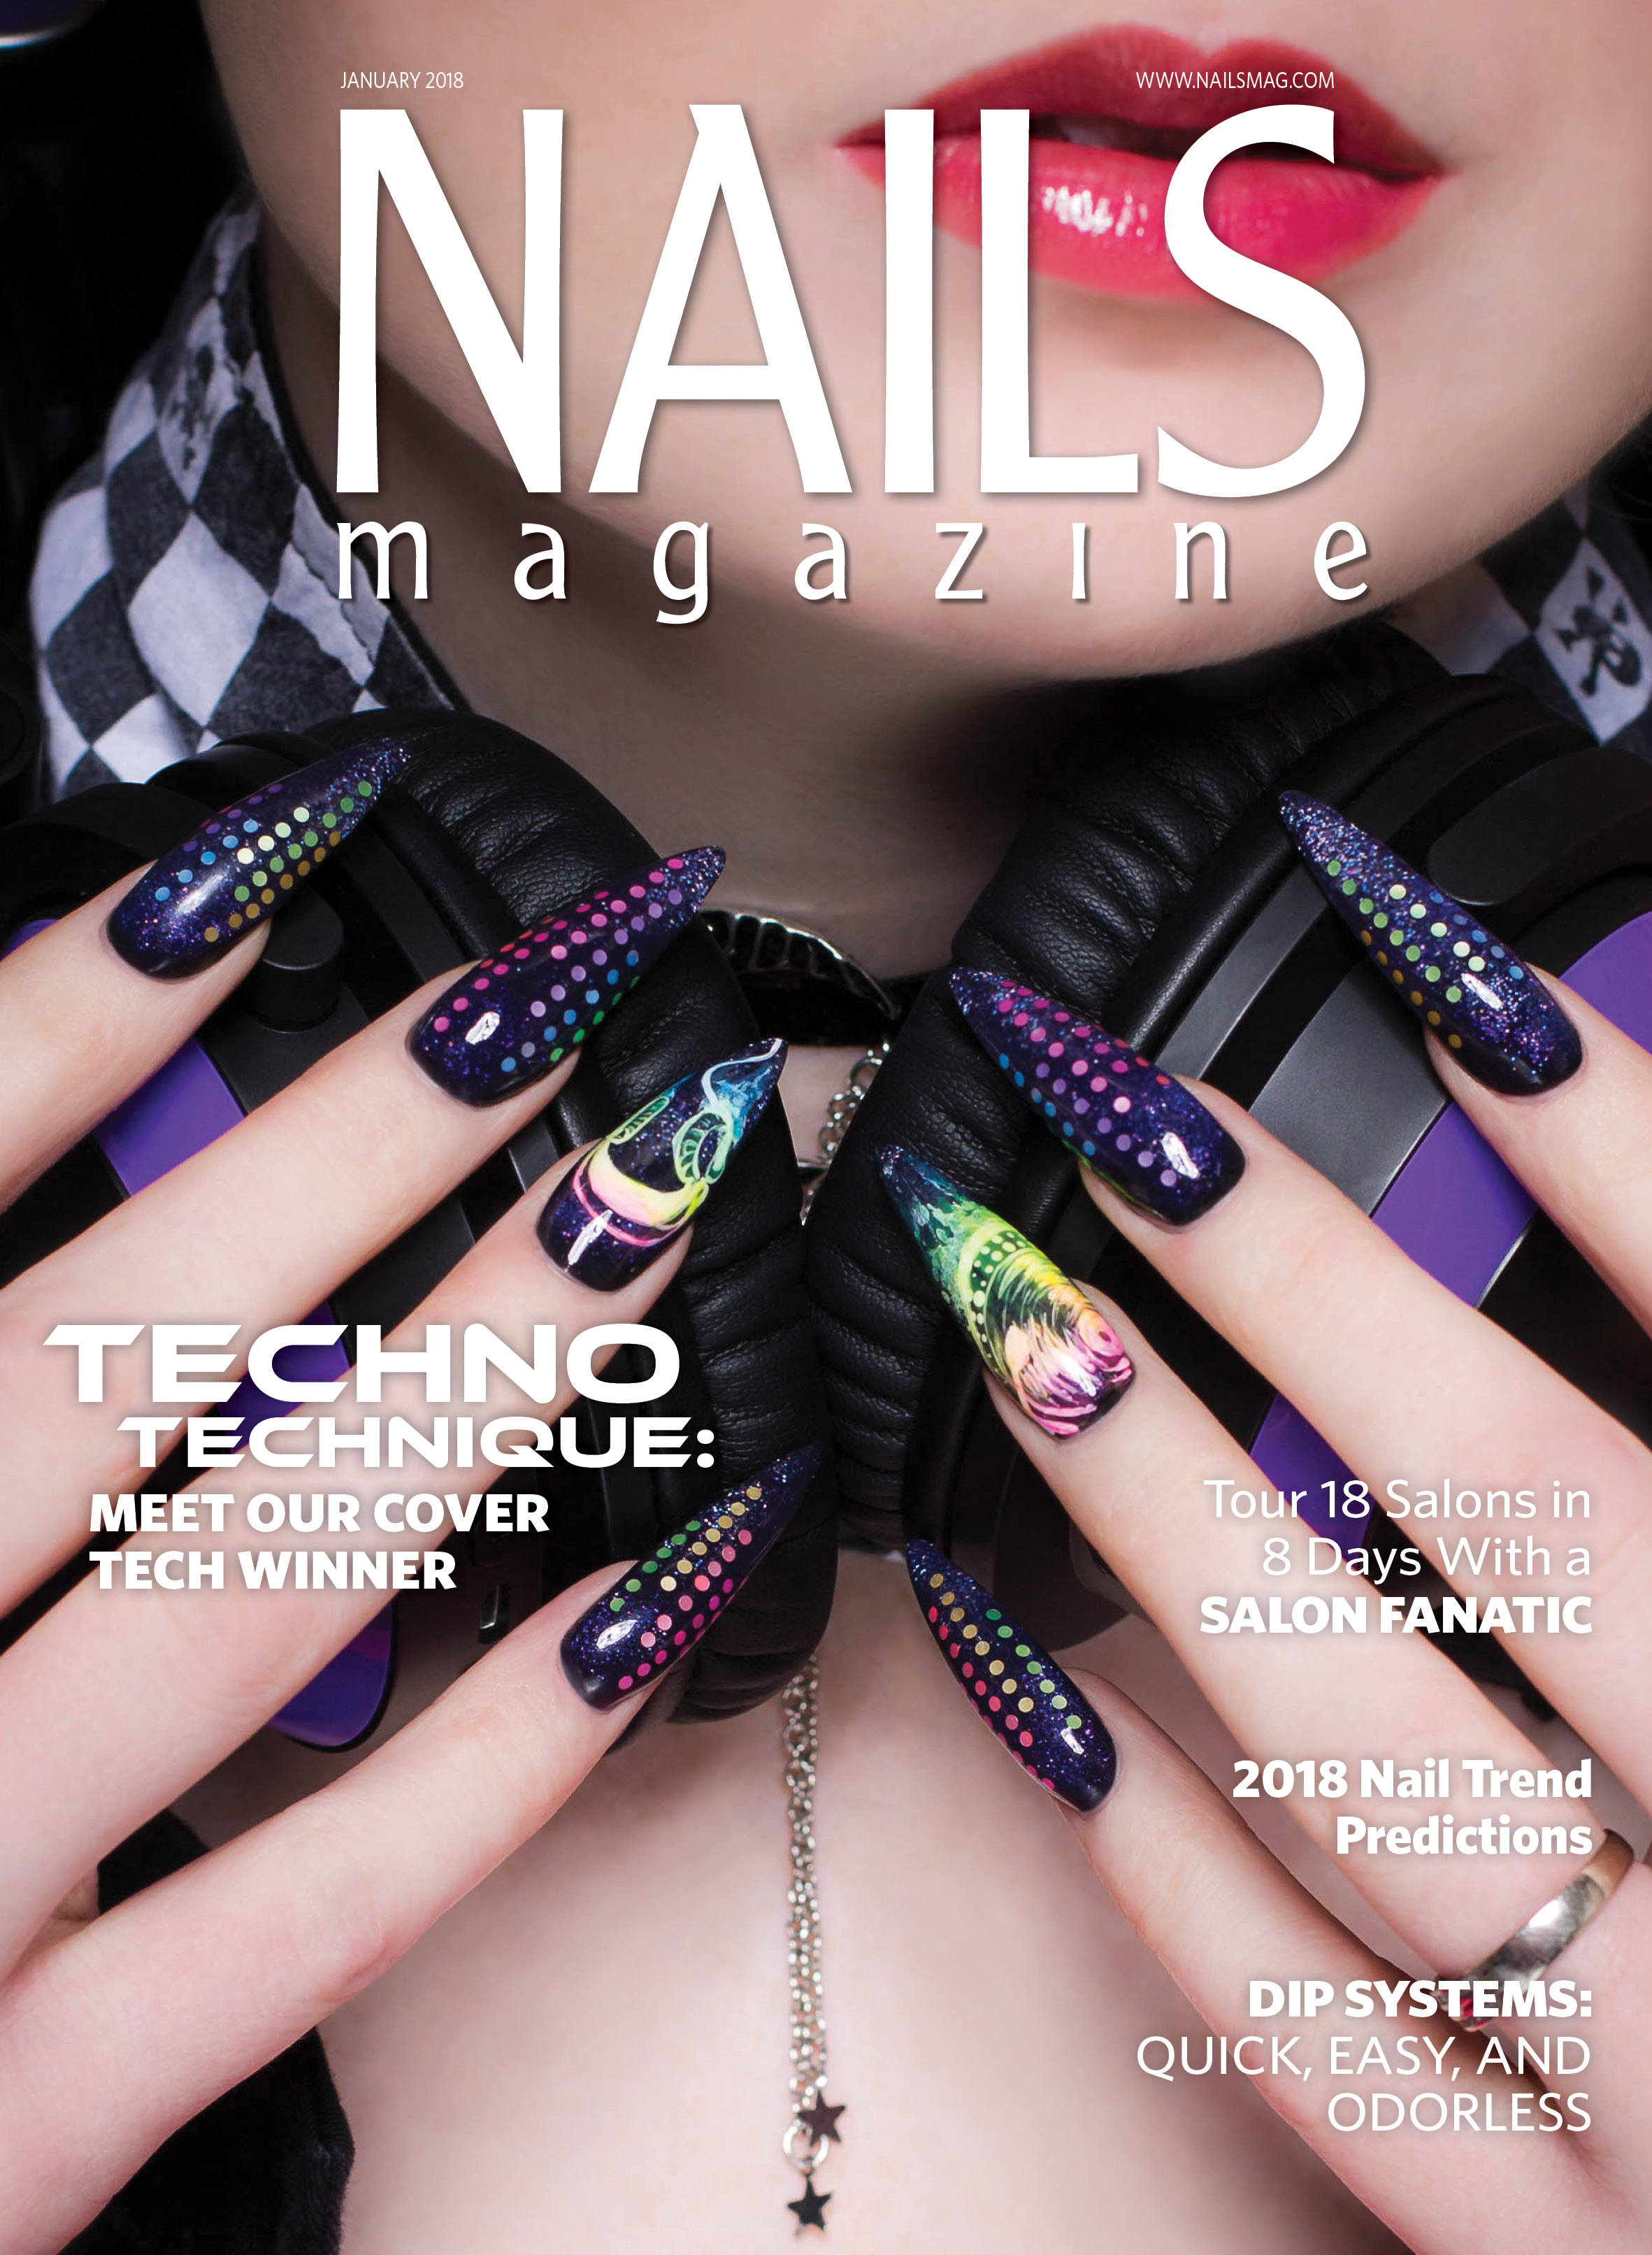 NAILS Magazine | January 2018 Issue